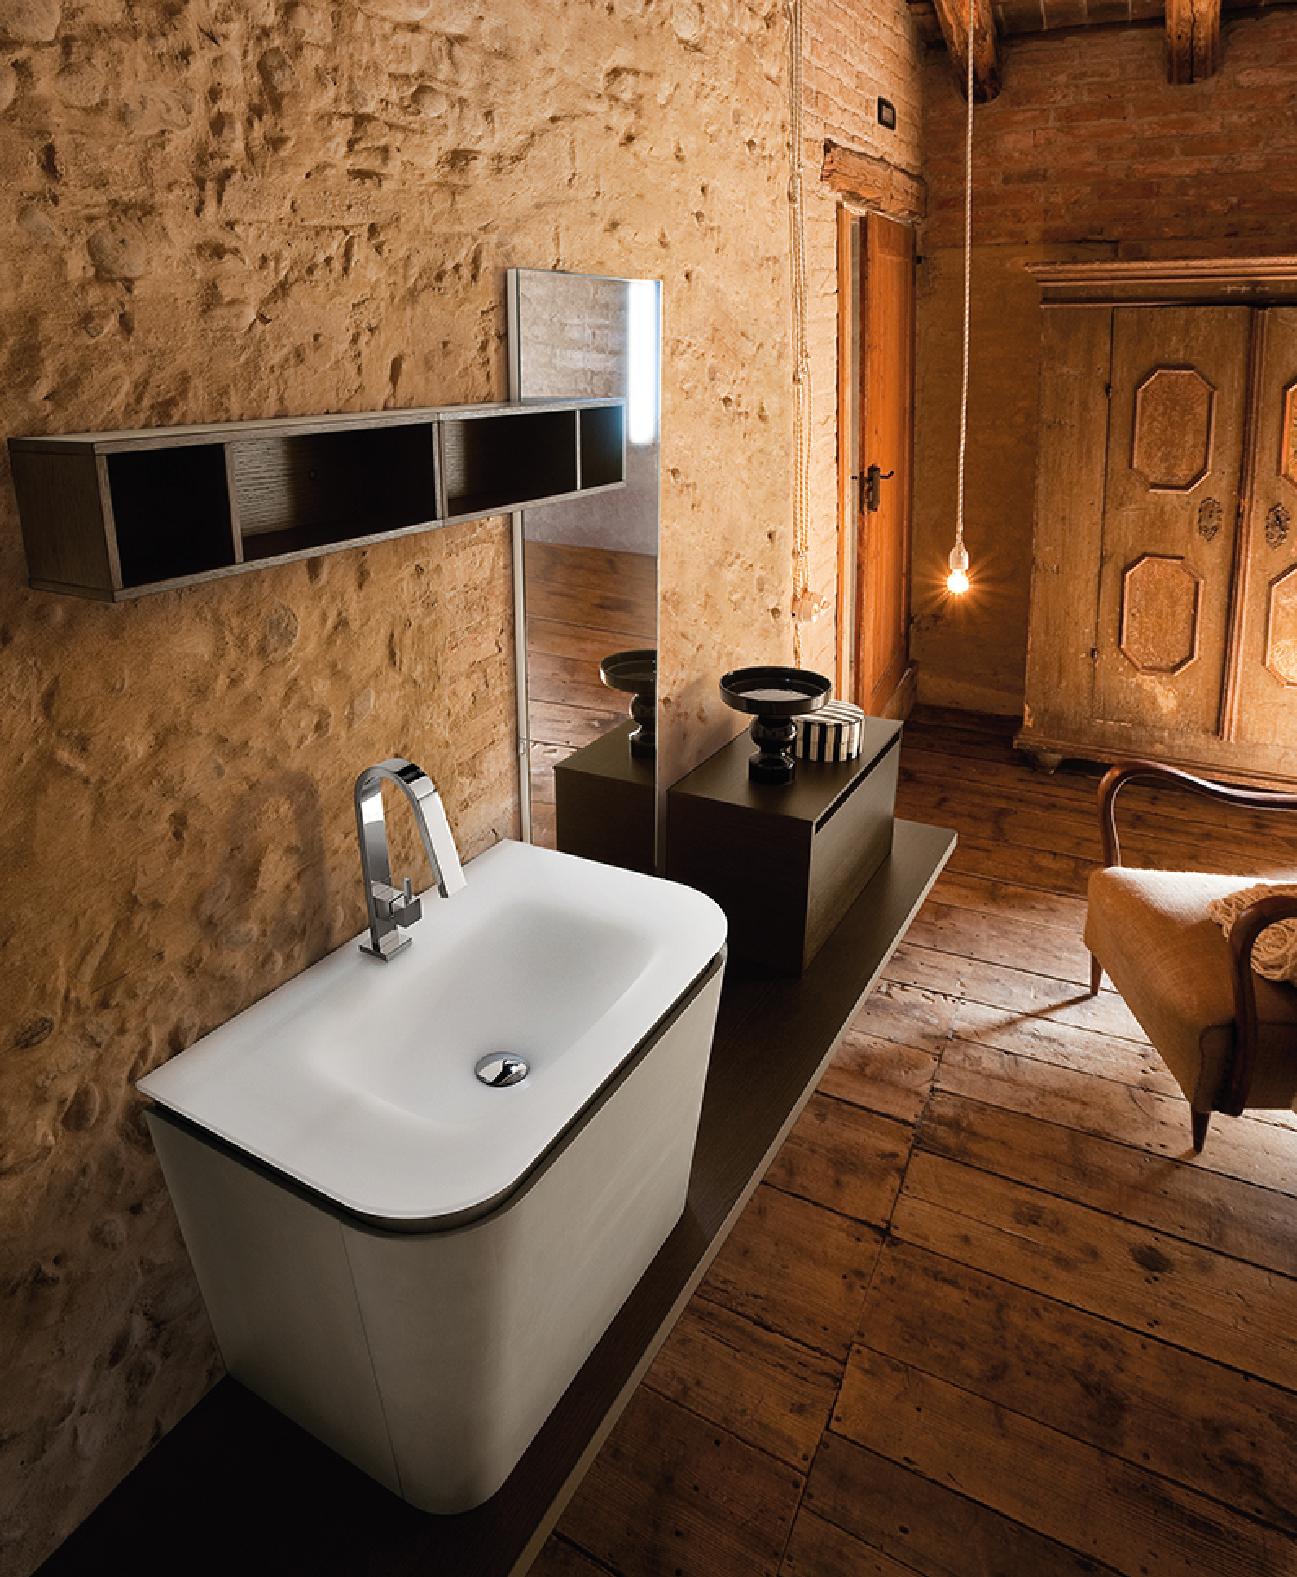 bathrooms-11.jpg